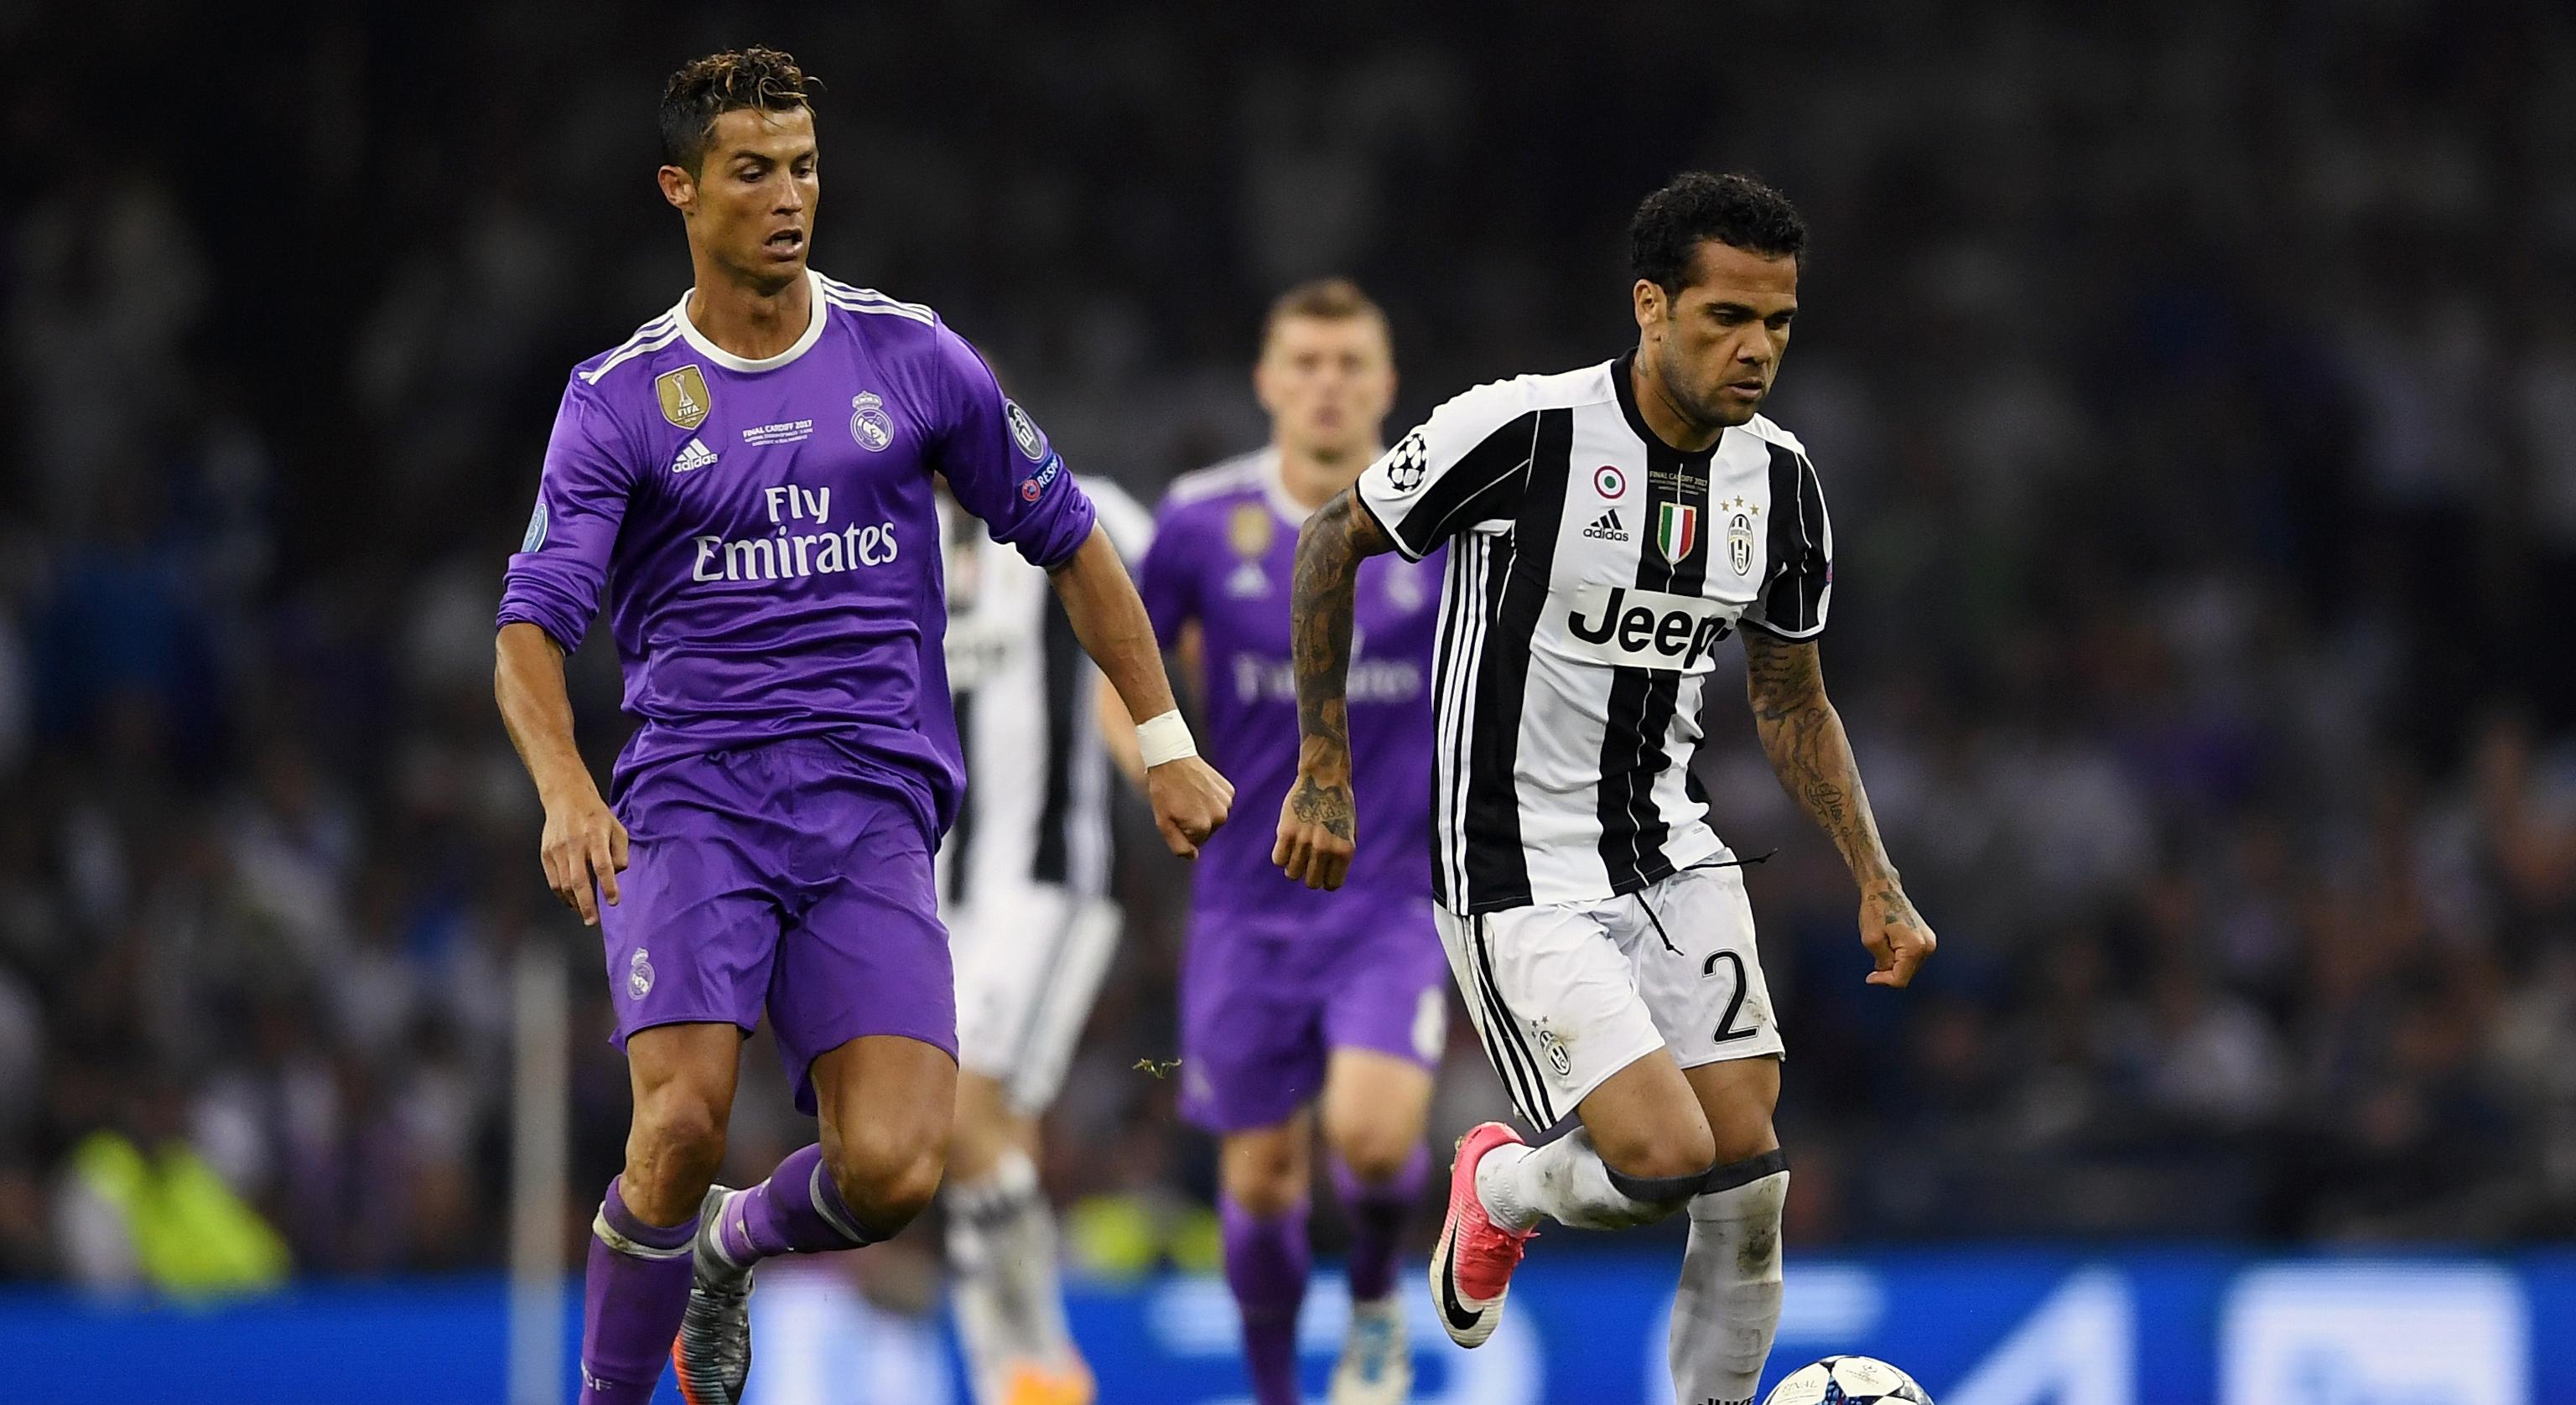 Dani Alves Cristiano Ronaldo Juventus Real Madrid